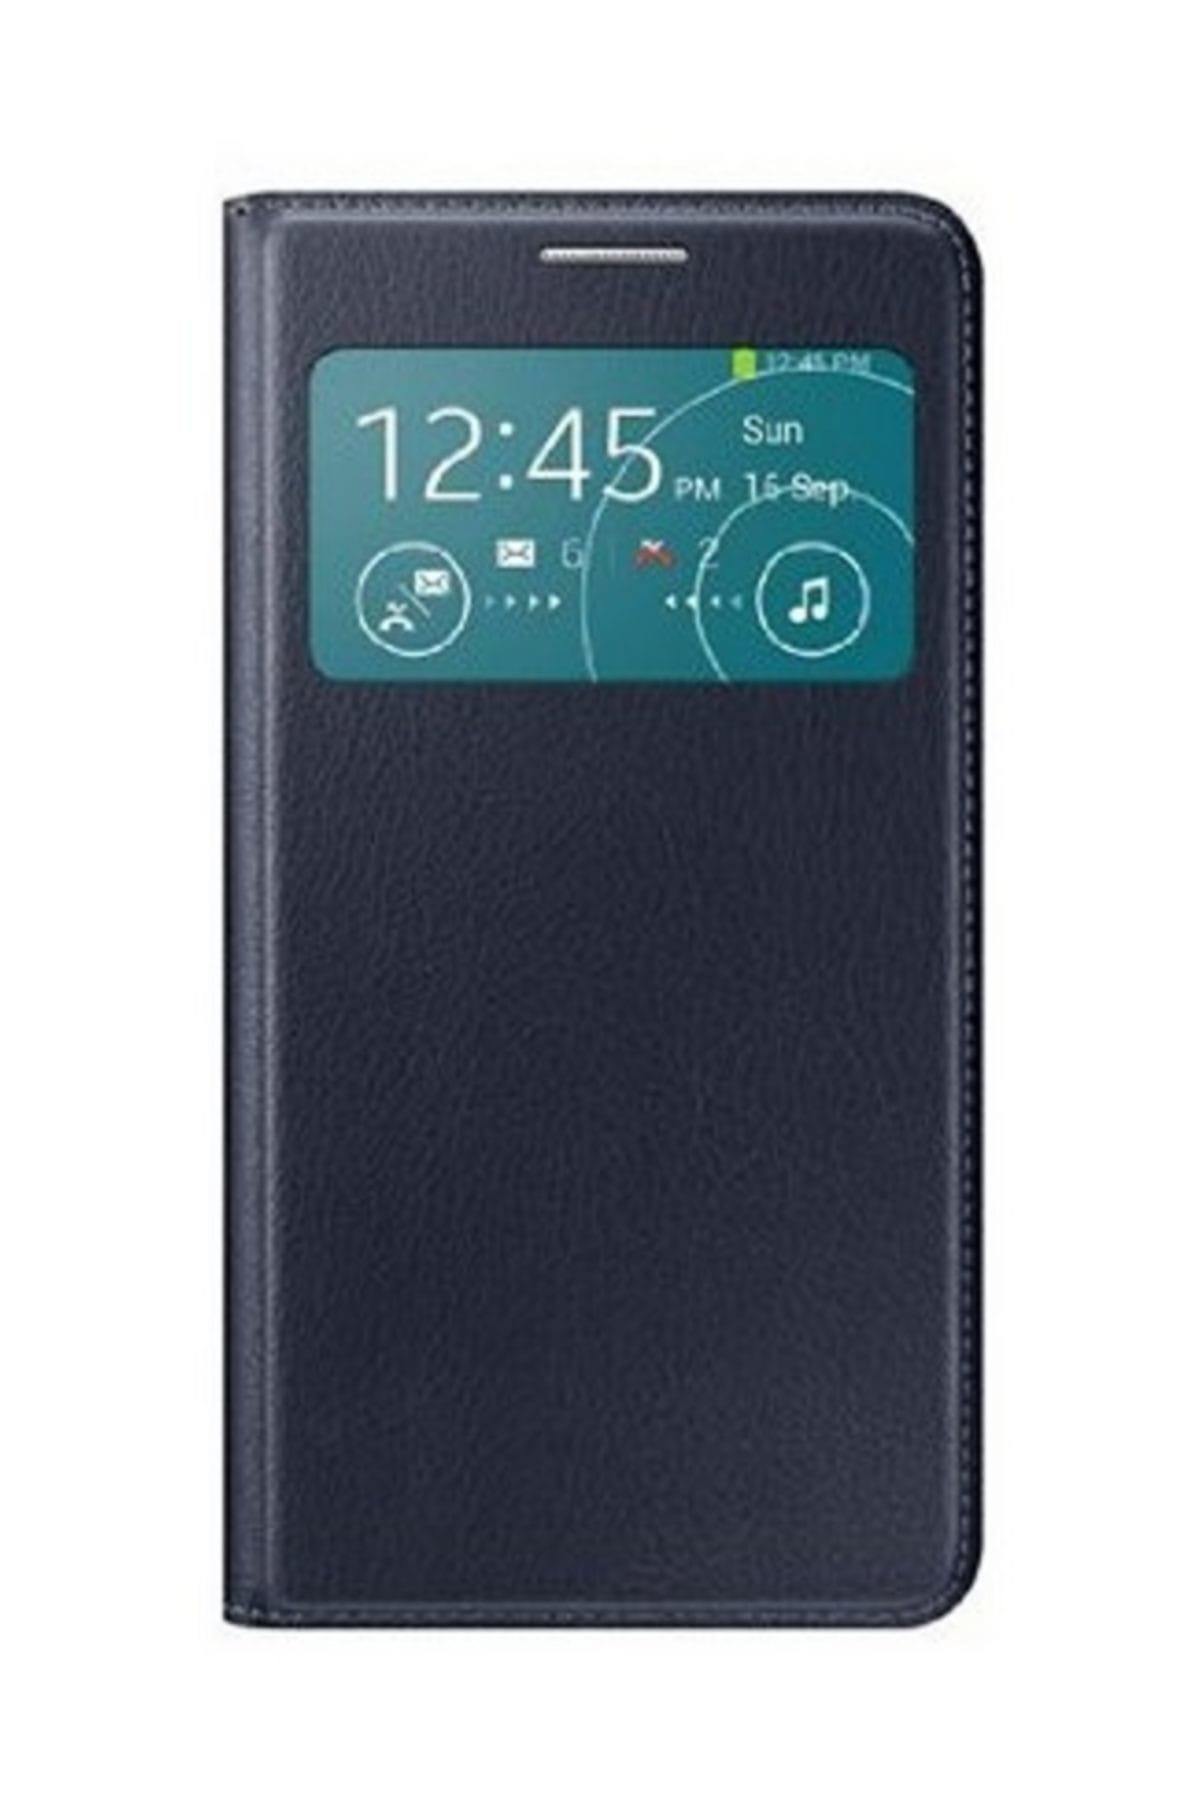 Samsung Galaxy S3 Neo (I9301) S View Orjinal Kılıf Mavi